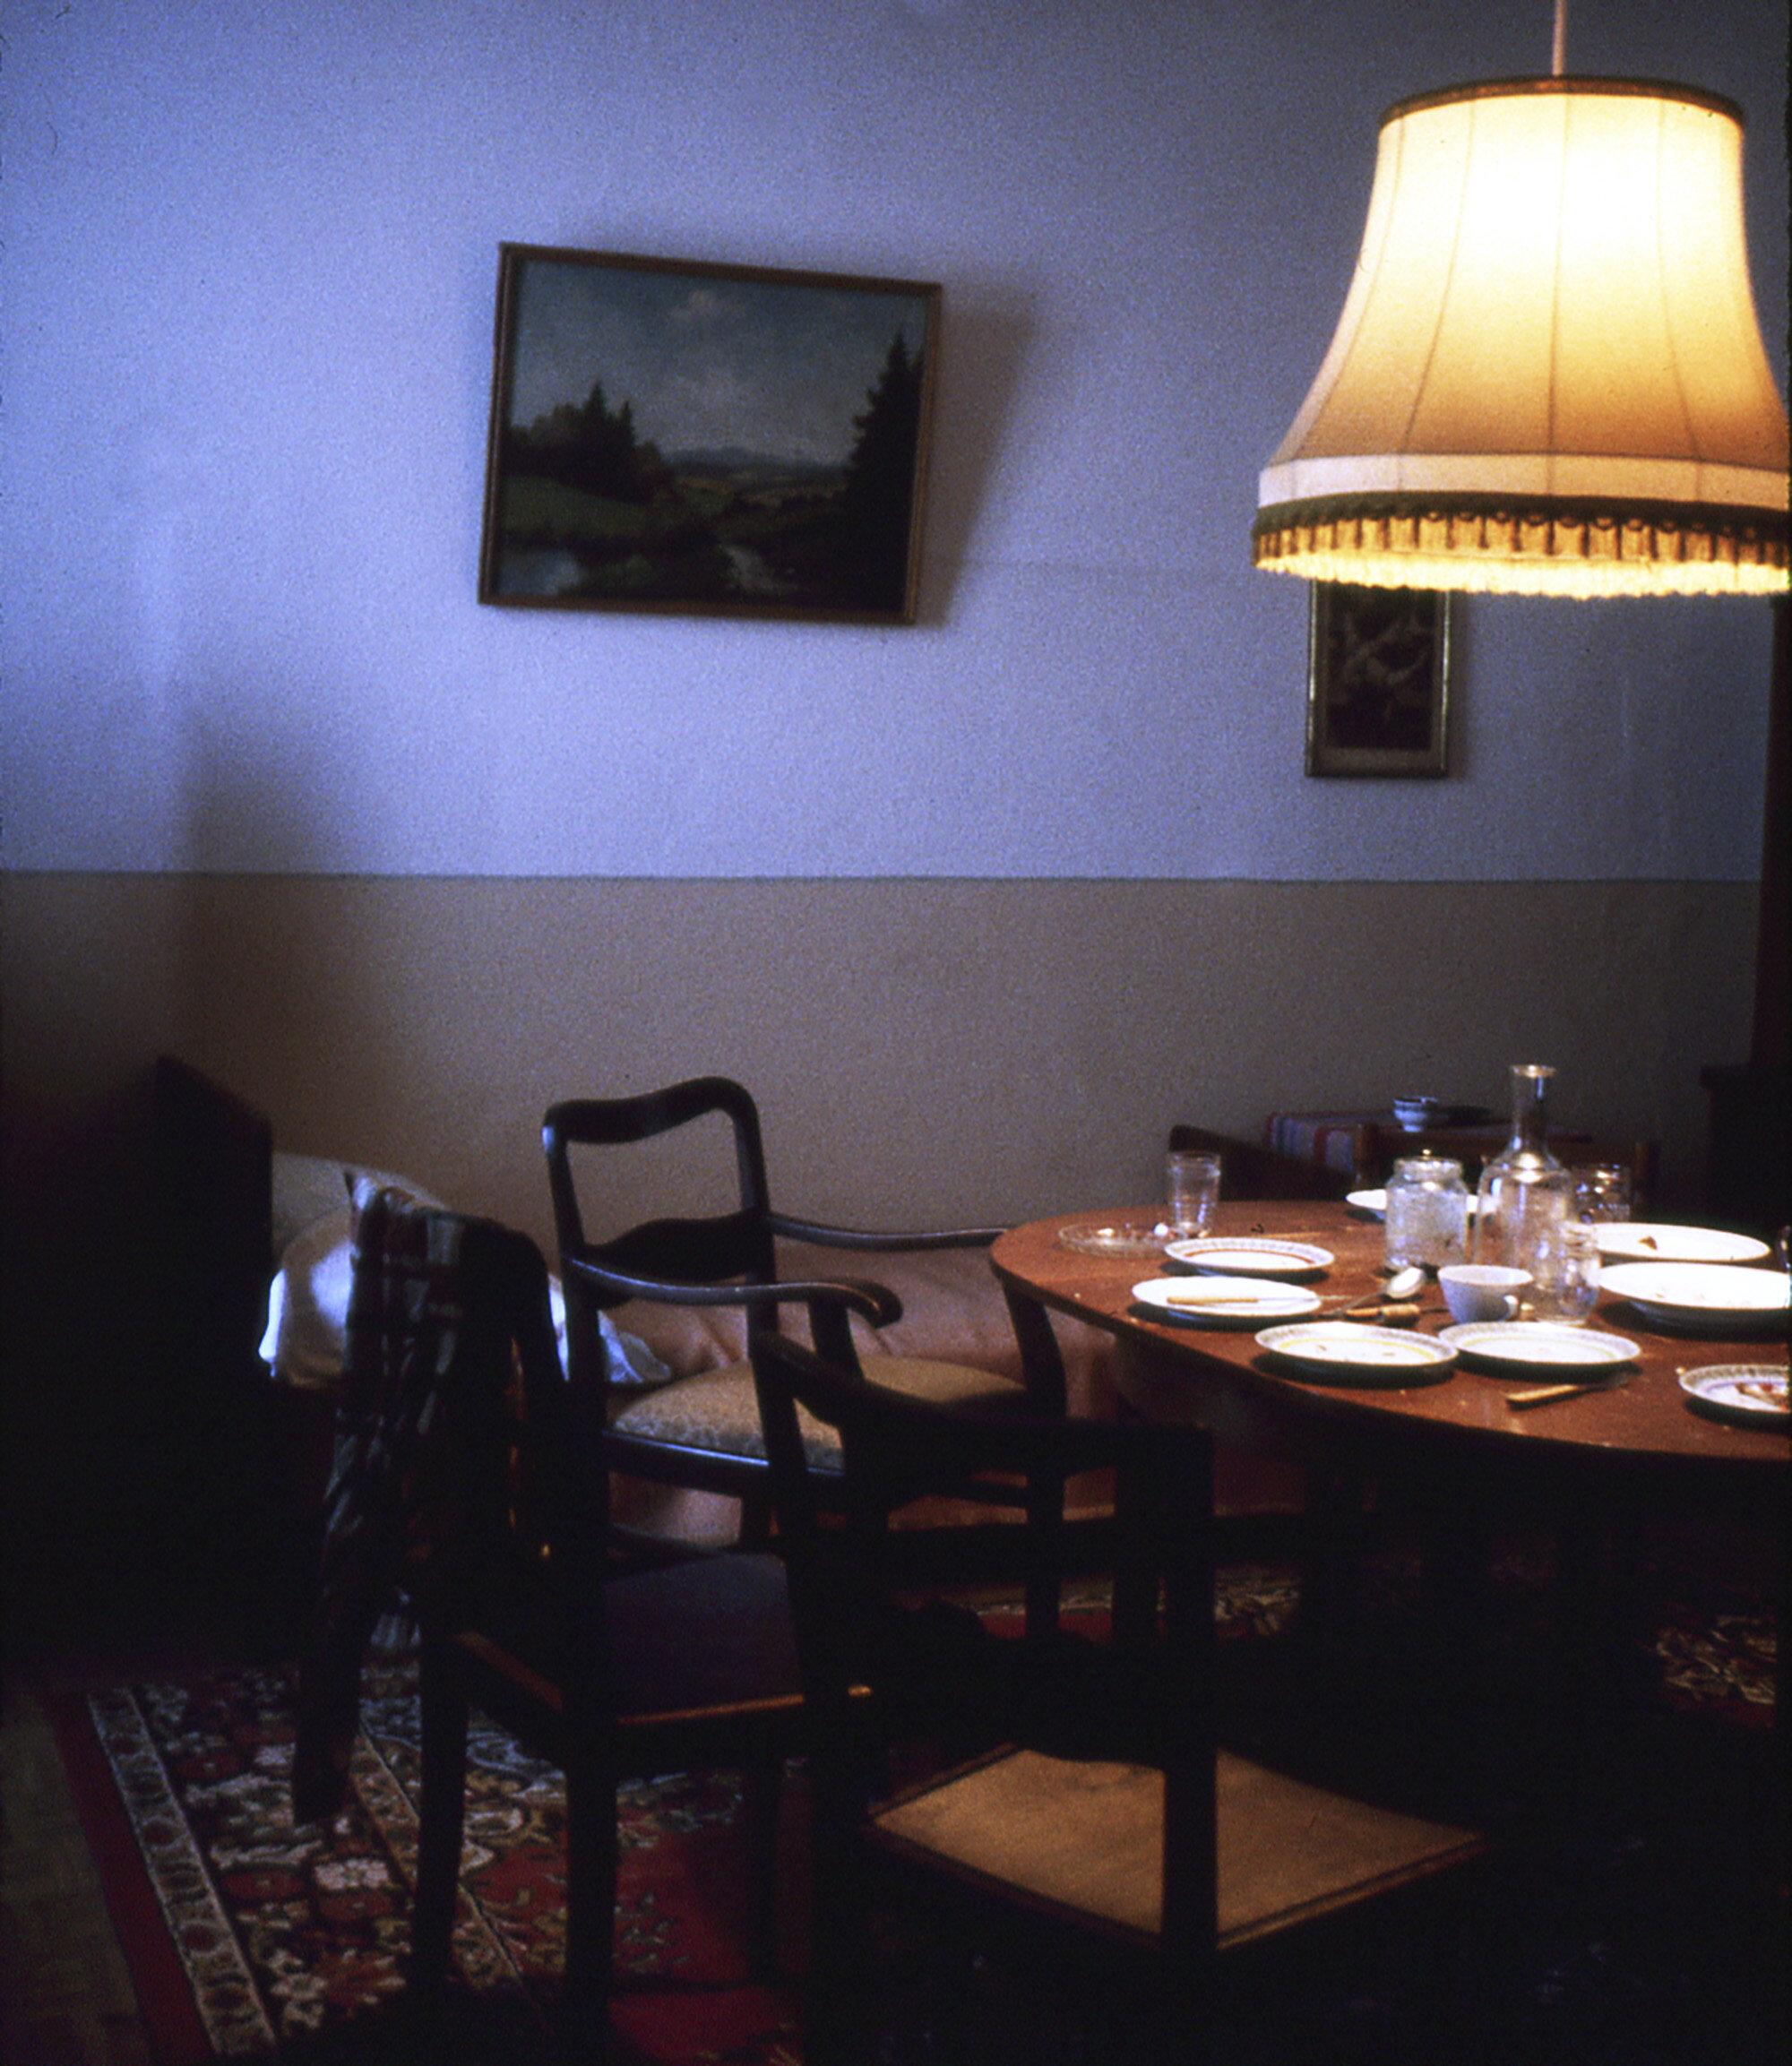 Voices-Behind-the-Door-Leipzig-1996-Photo-by-Emilia-Kabakov-007.jpg